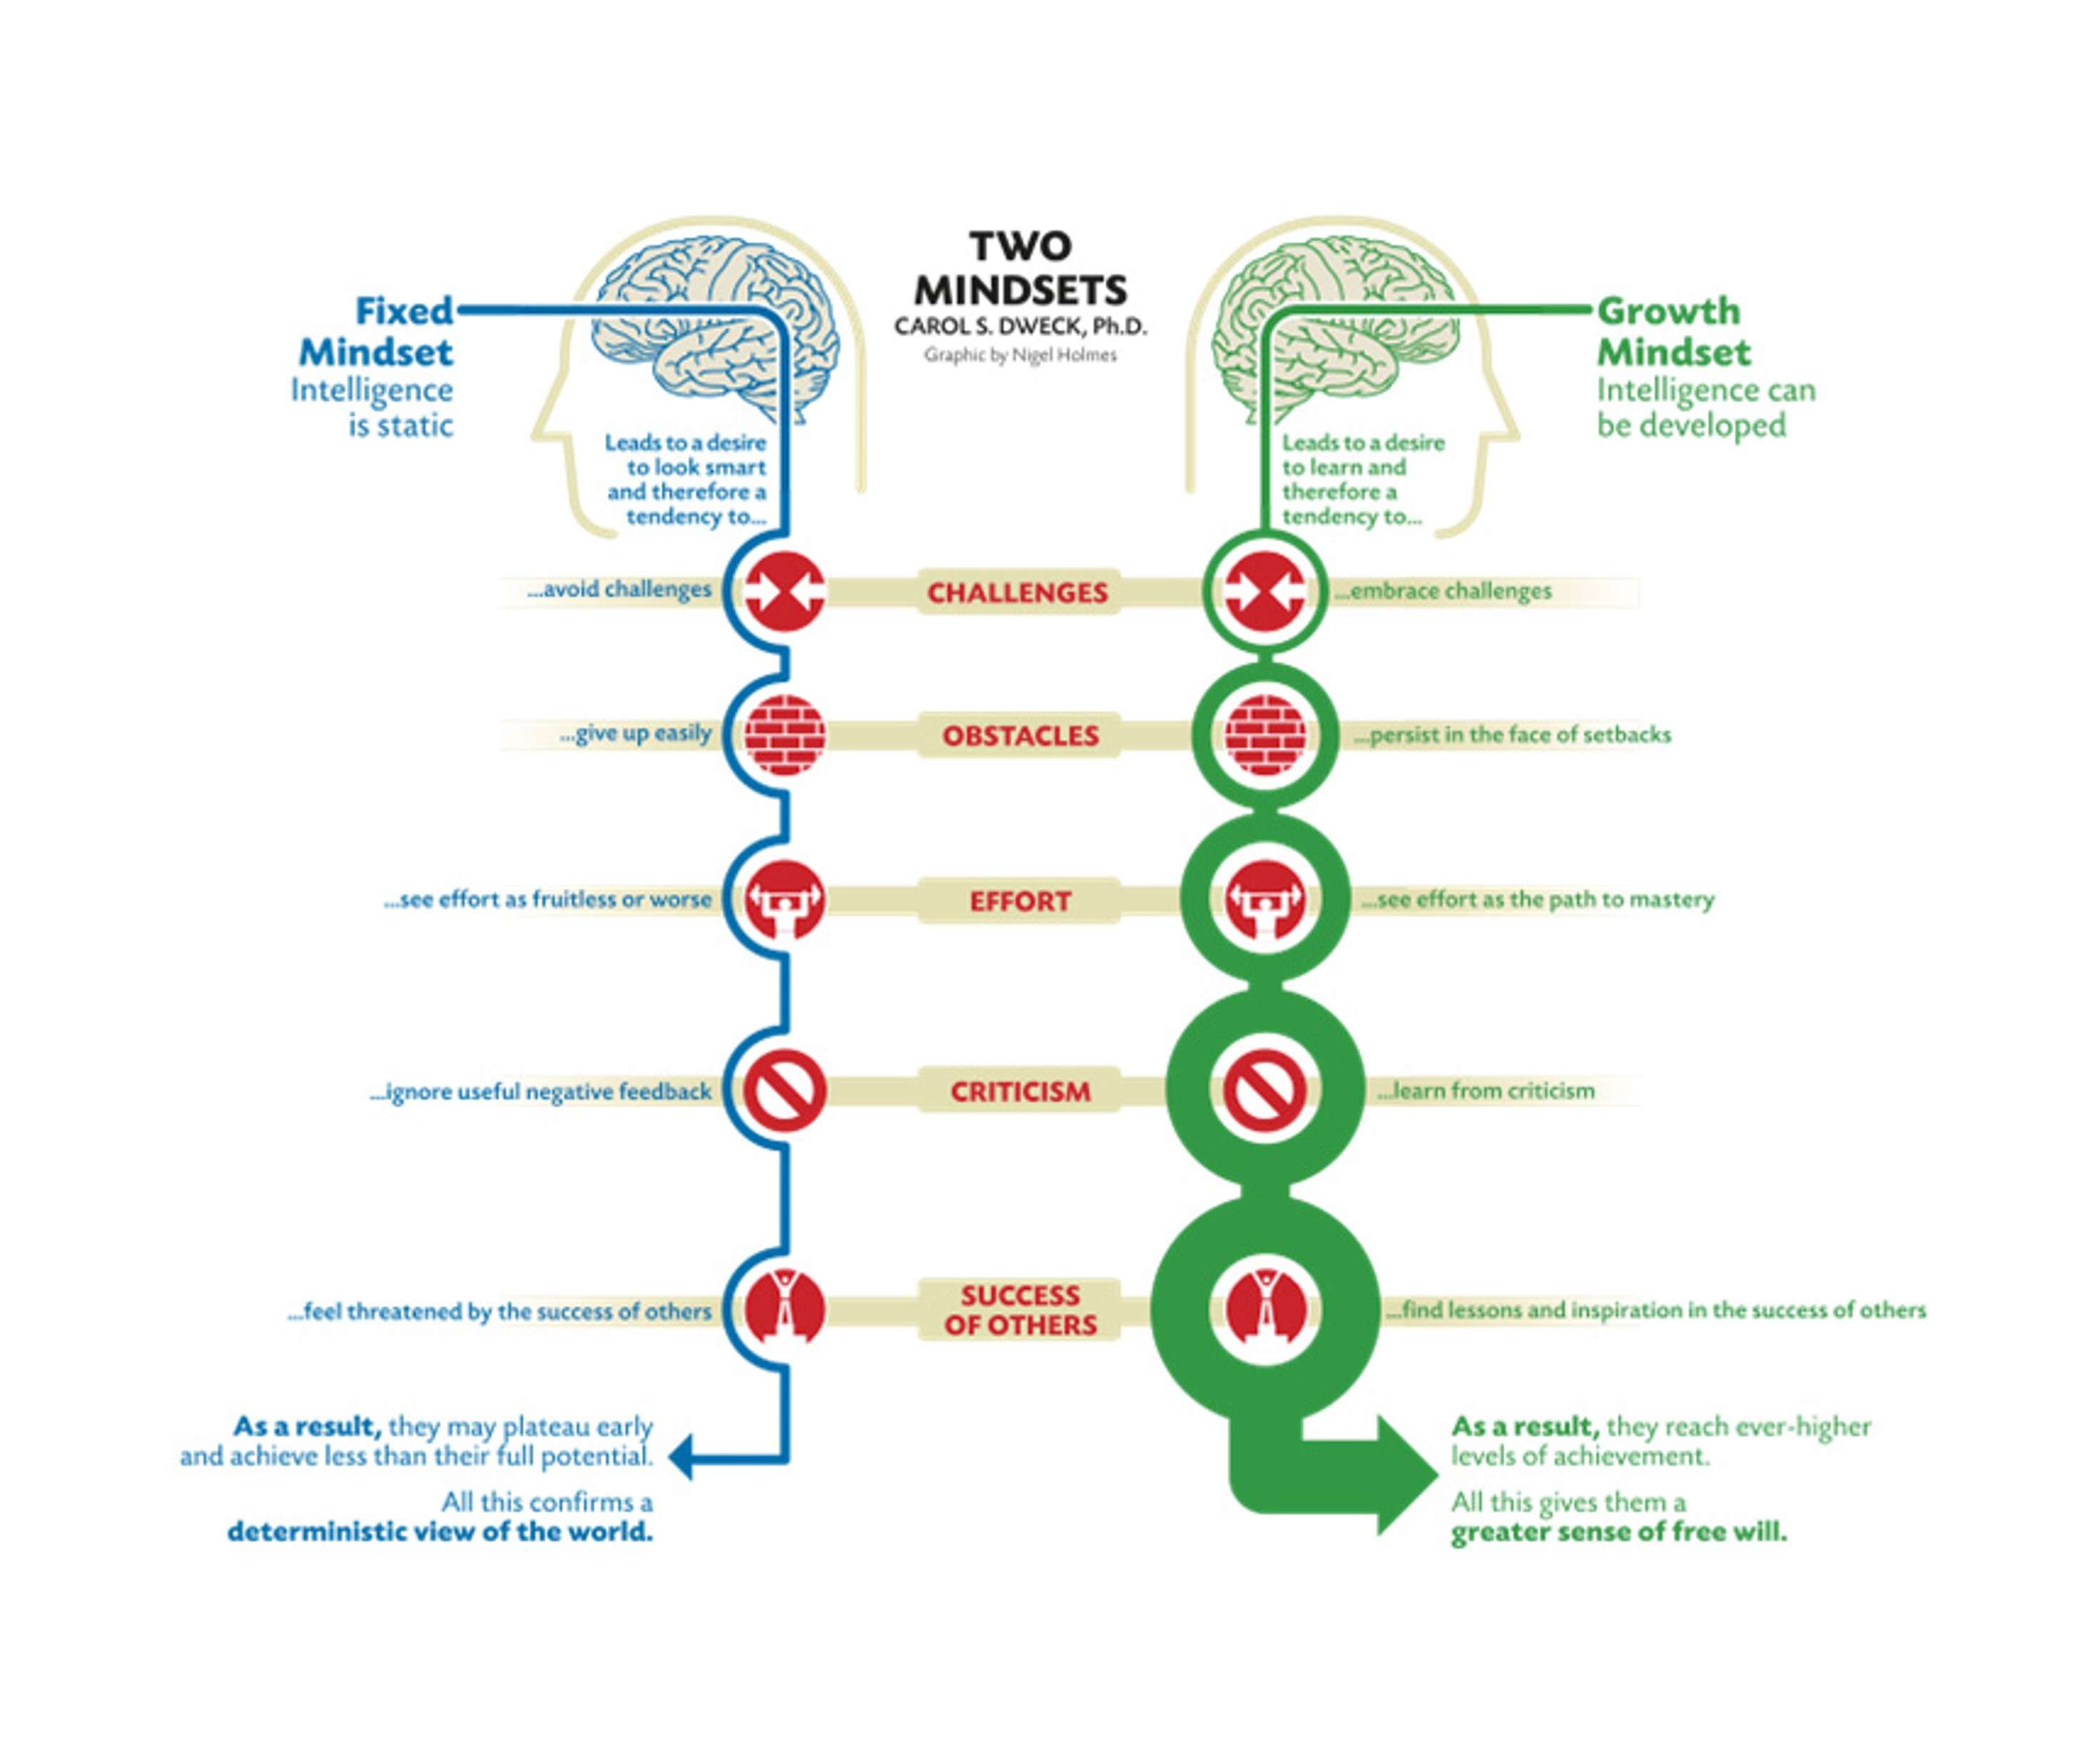 Fixed Mindset Versus Growth Mindset What Mindset Do You